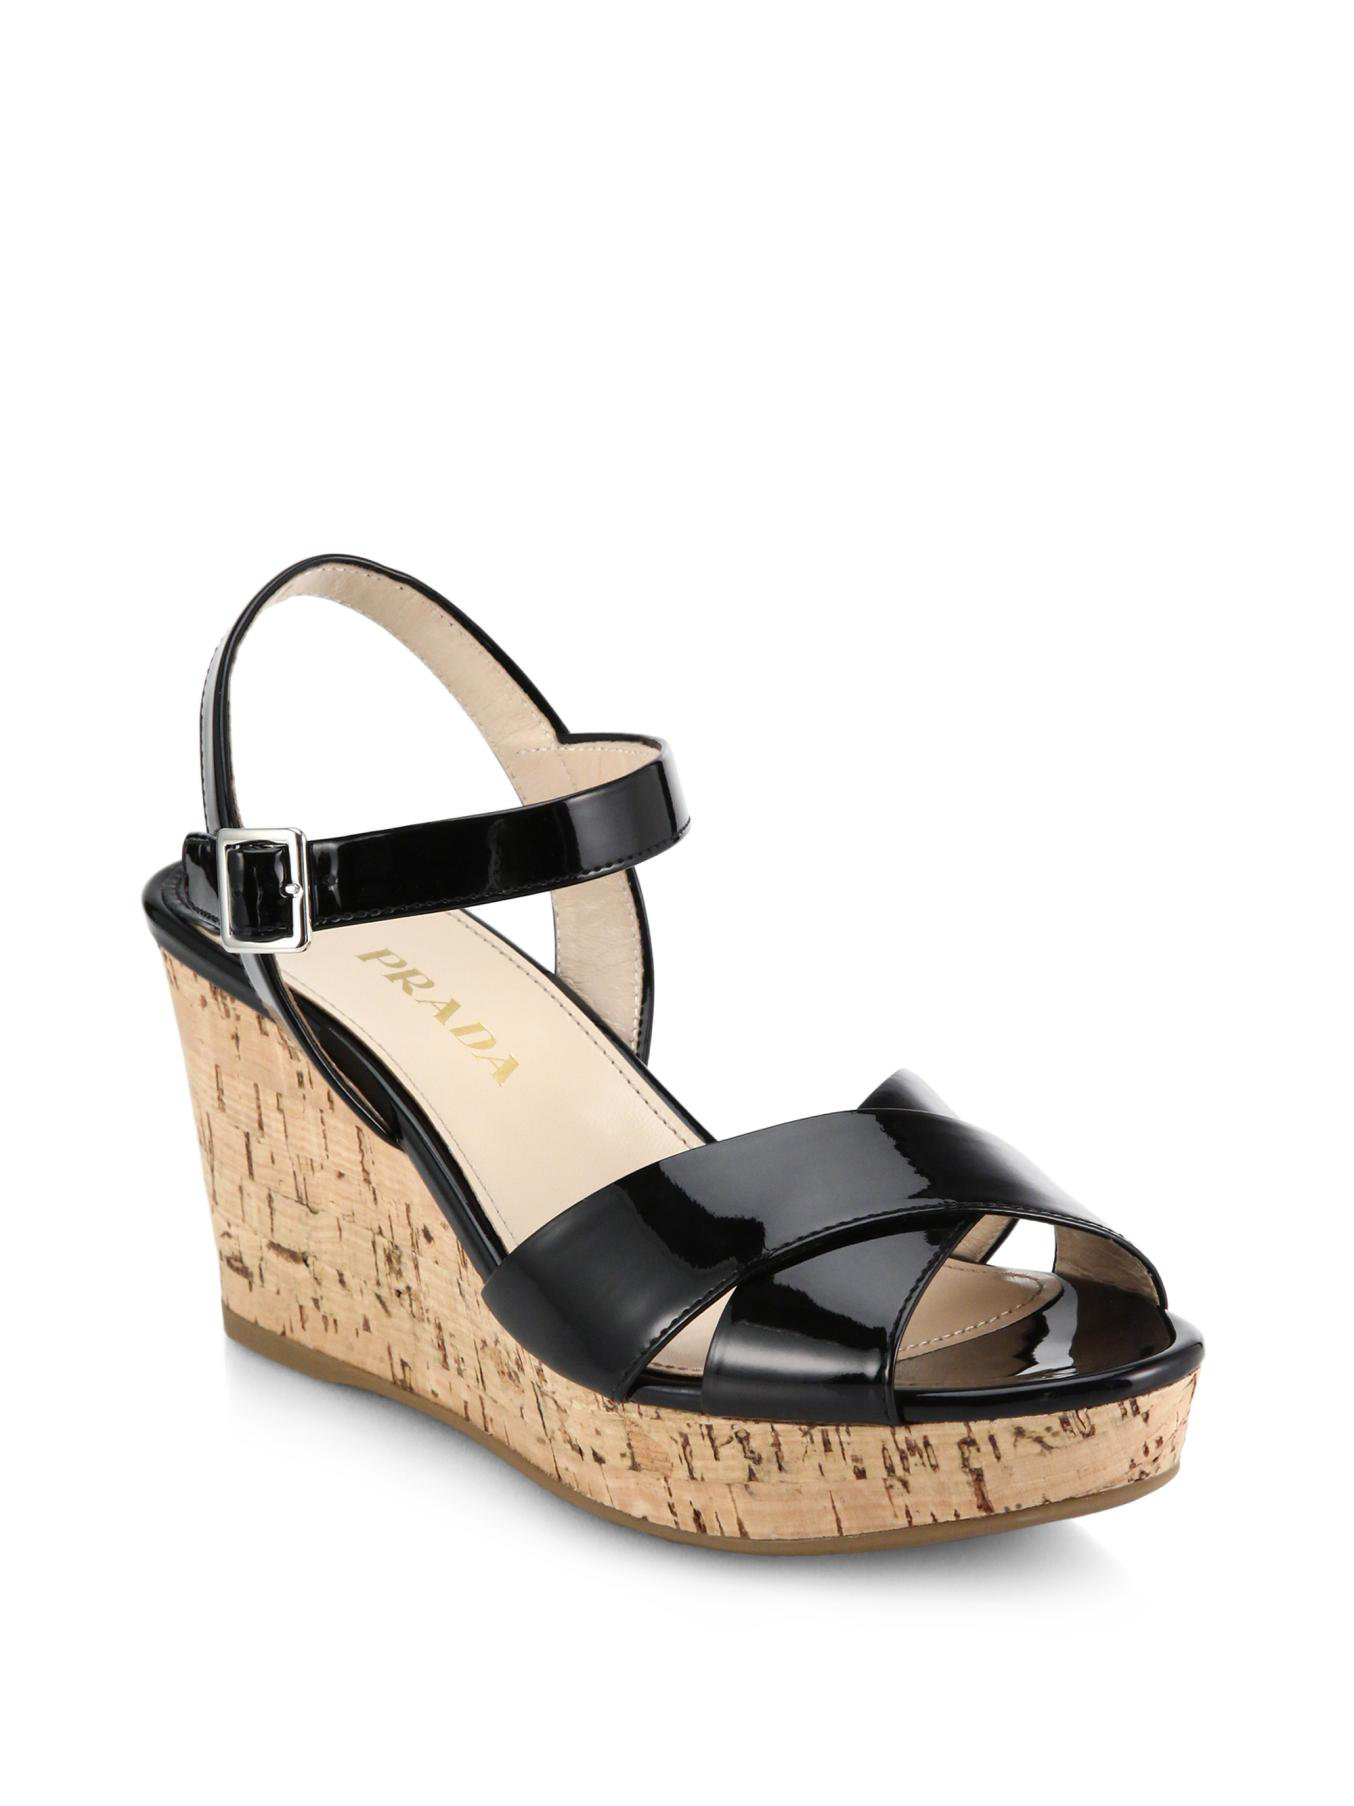 b3dfb4a21f6 Lyst - Prada Cork-wedge Patent Leather Sandals in Black